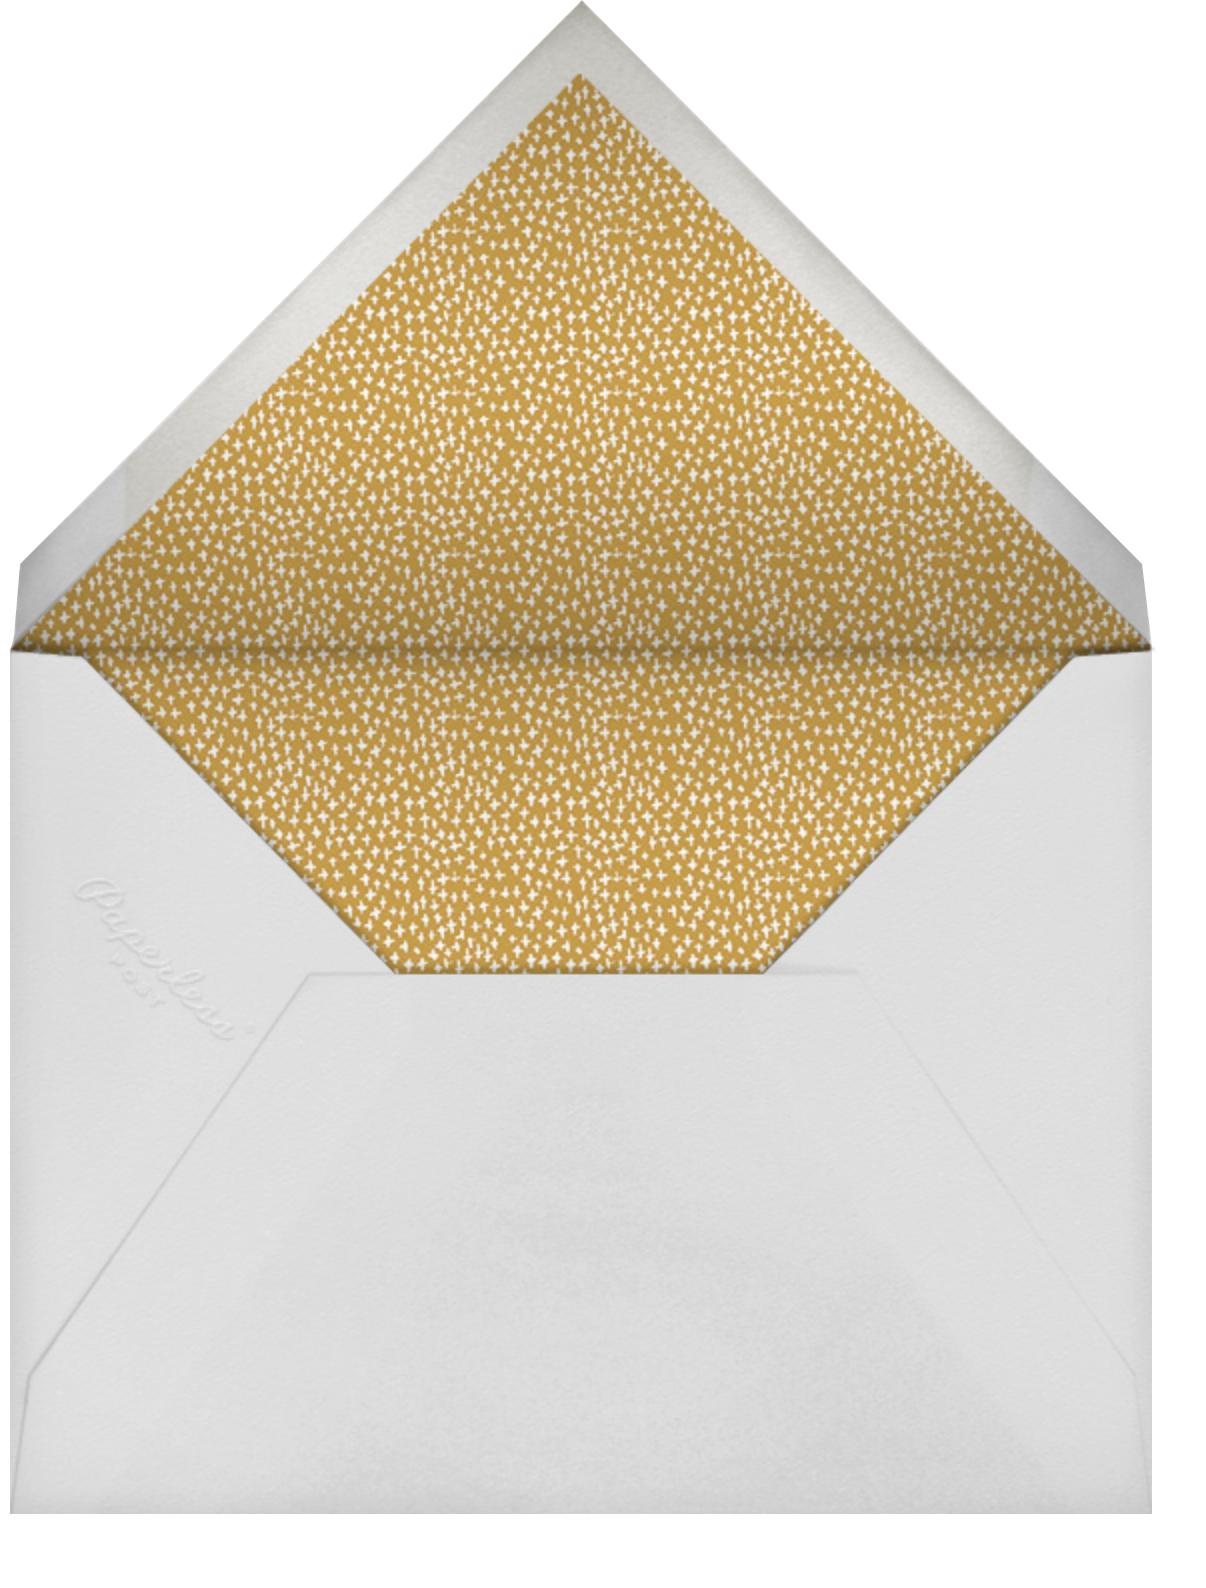 Among the Daisies - Amazon - Mr. Boddington's Studio - Save the date - envelope back